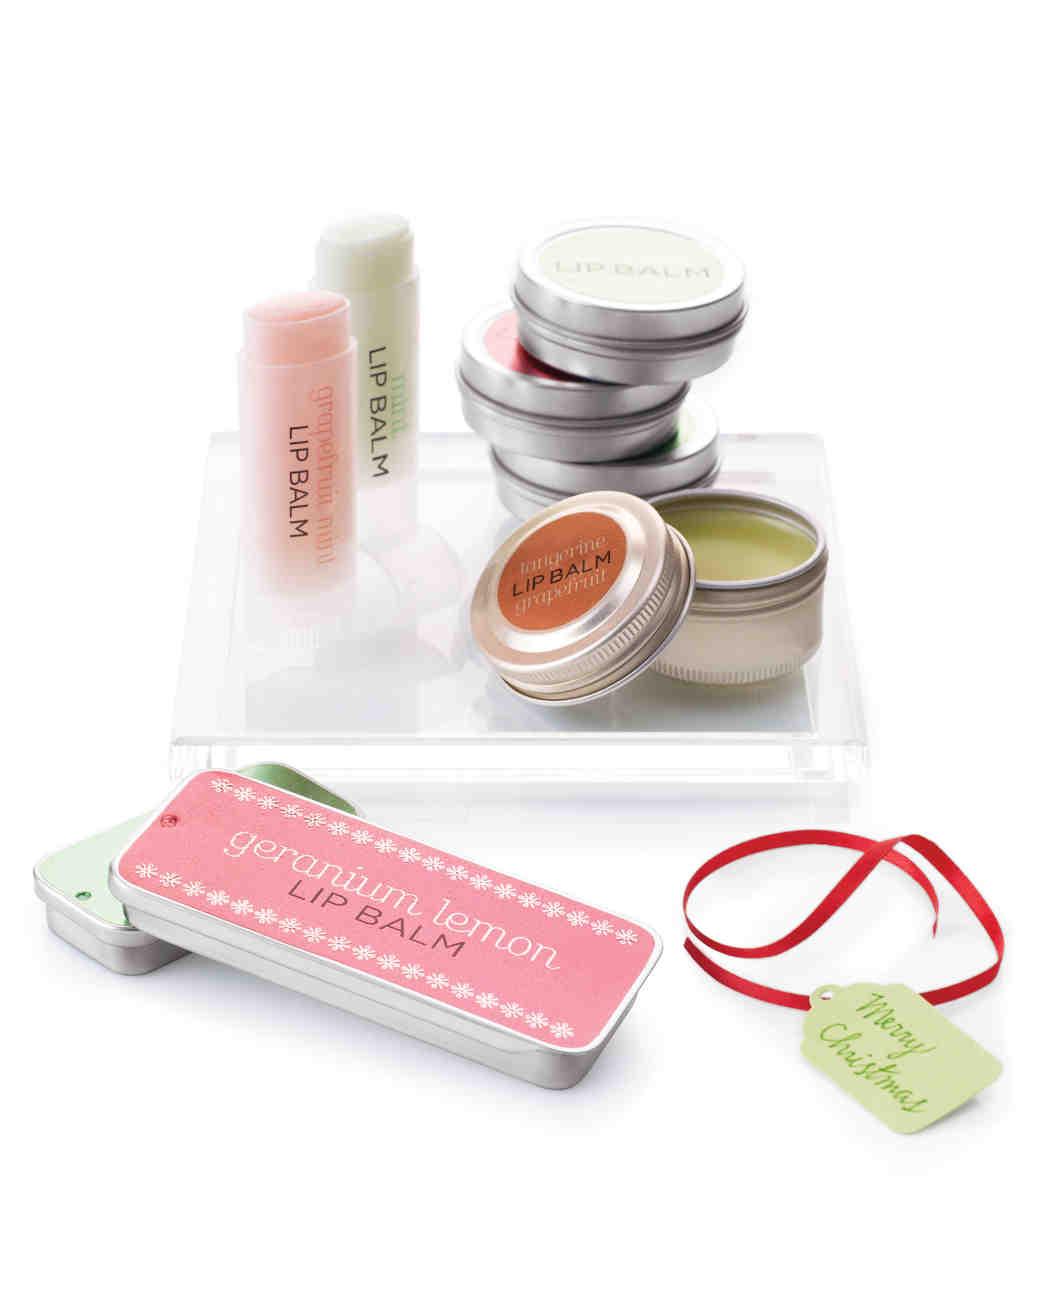 diy-bridesmaid-gifts-lip-balm-msl-dec-08-0515.jpg